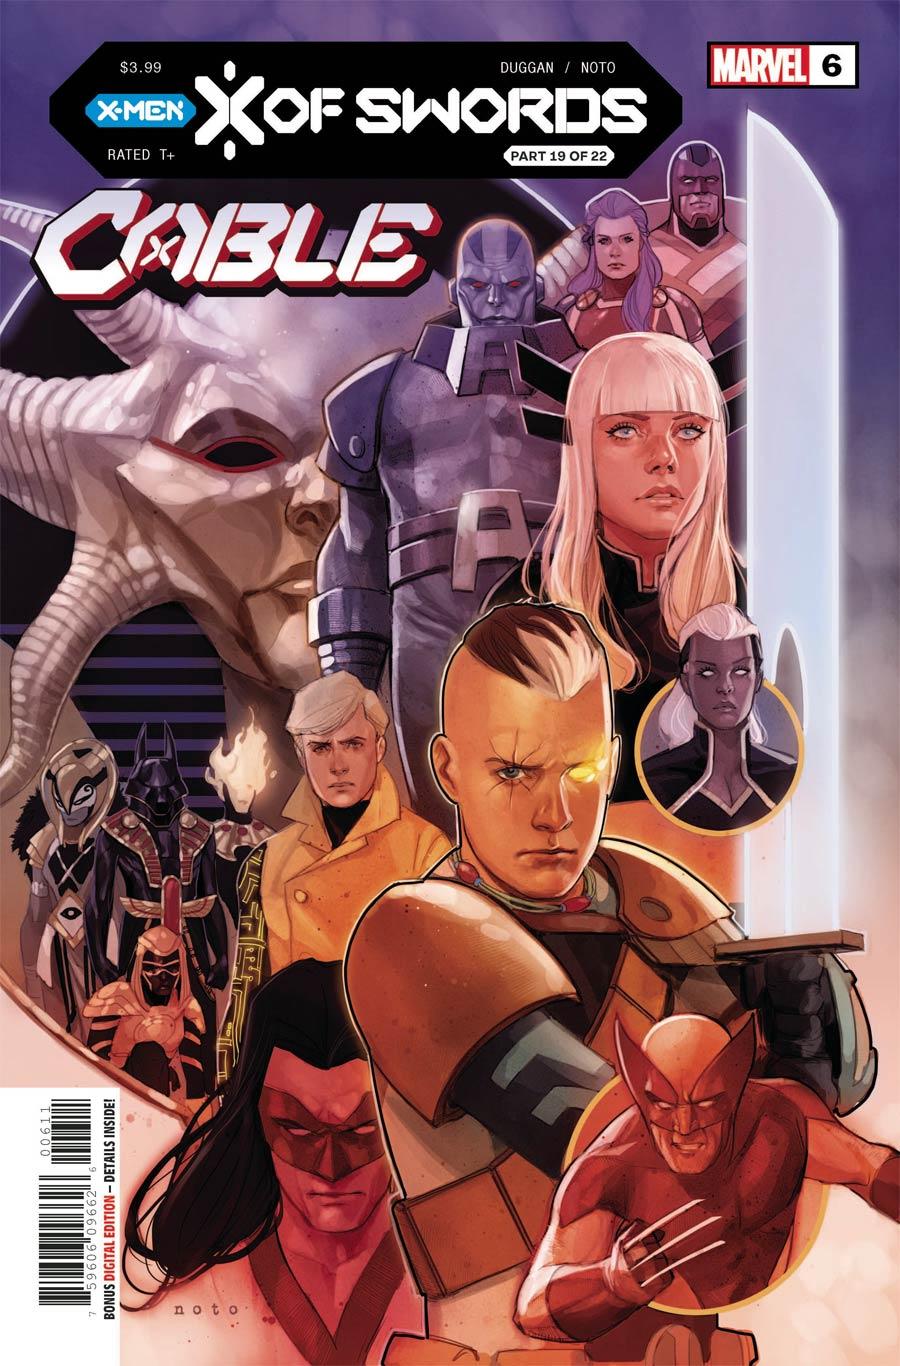 Cable Vol 4 #6 Cover A Regular Phil Noto Cover (X Of Swords Part 19)